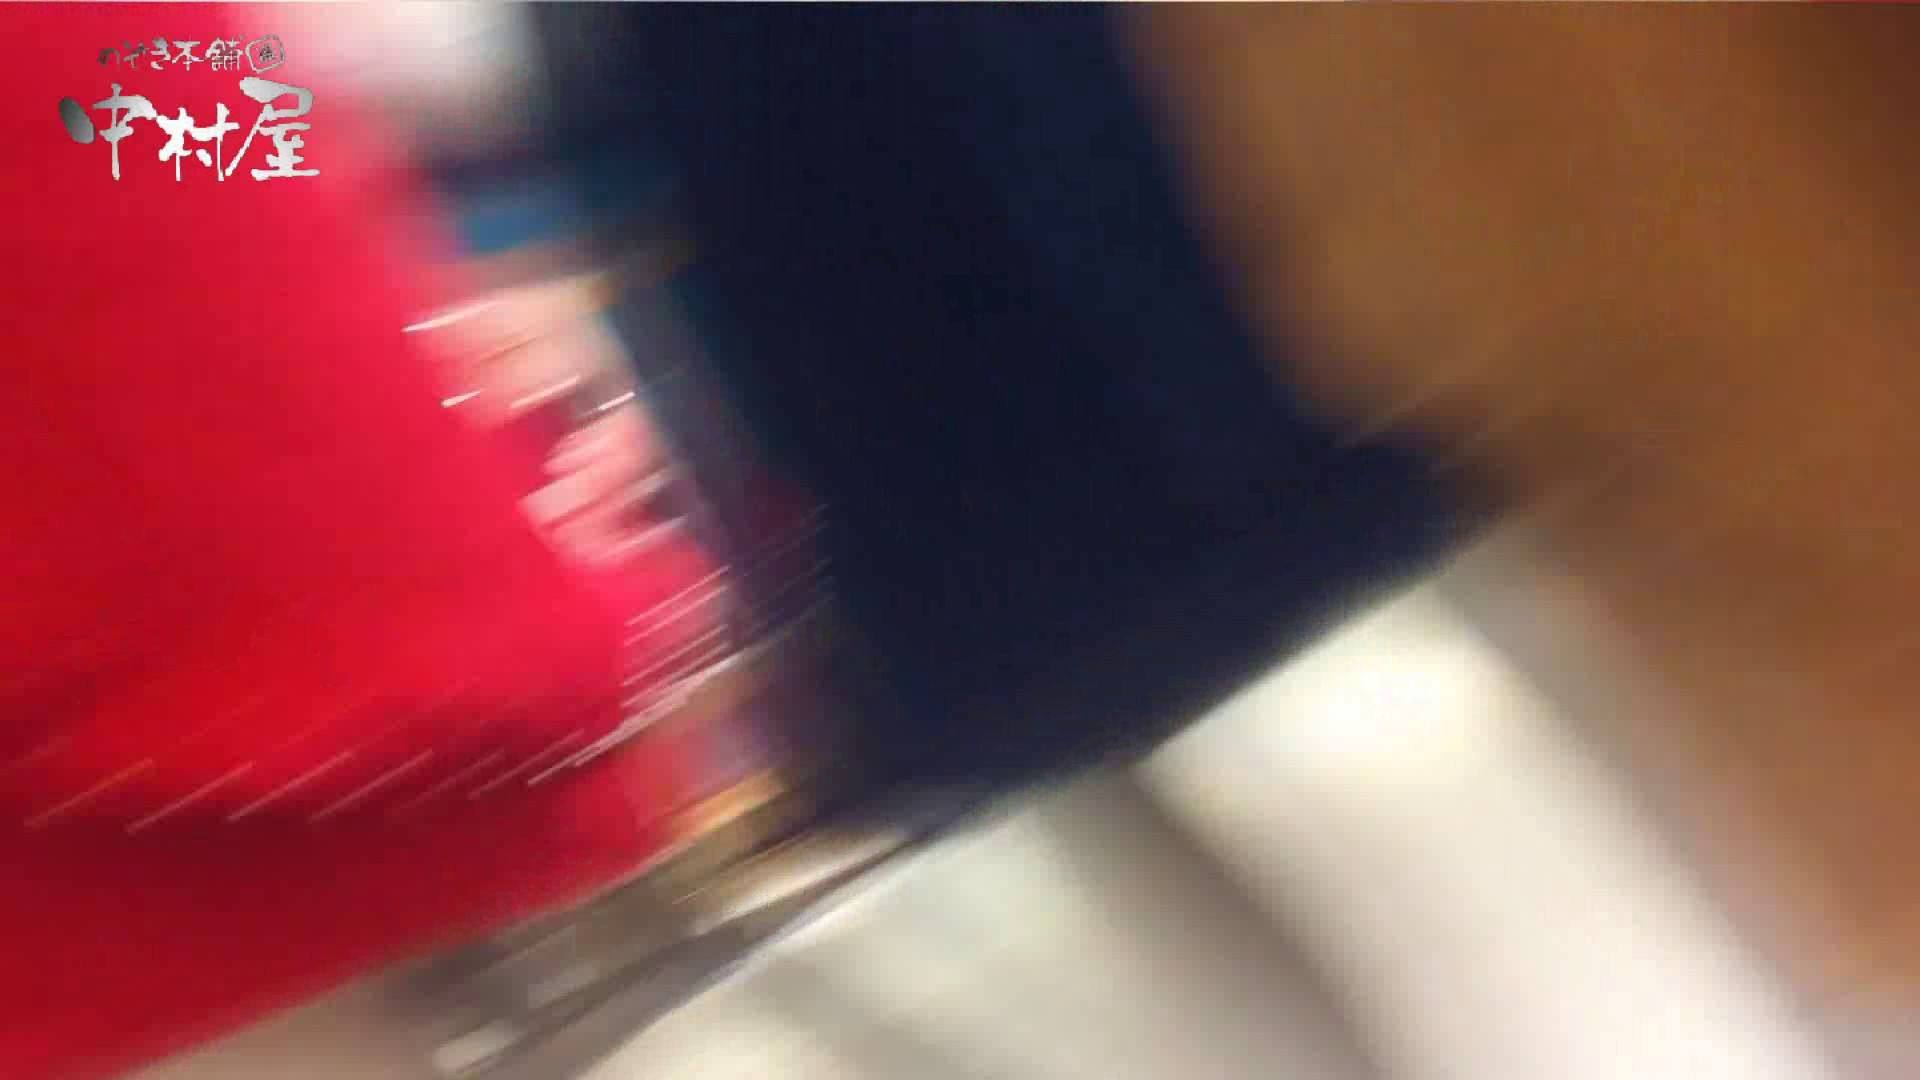 vol.43 可愛いカリスマ店員限定‼胸チラ&パンチラ 美脚おねーさんの胸元ゲット! エロティックなOL AV無料動画キャプチャ 86画像 14